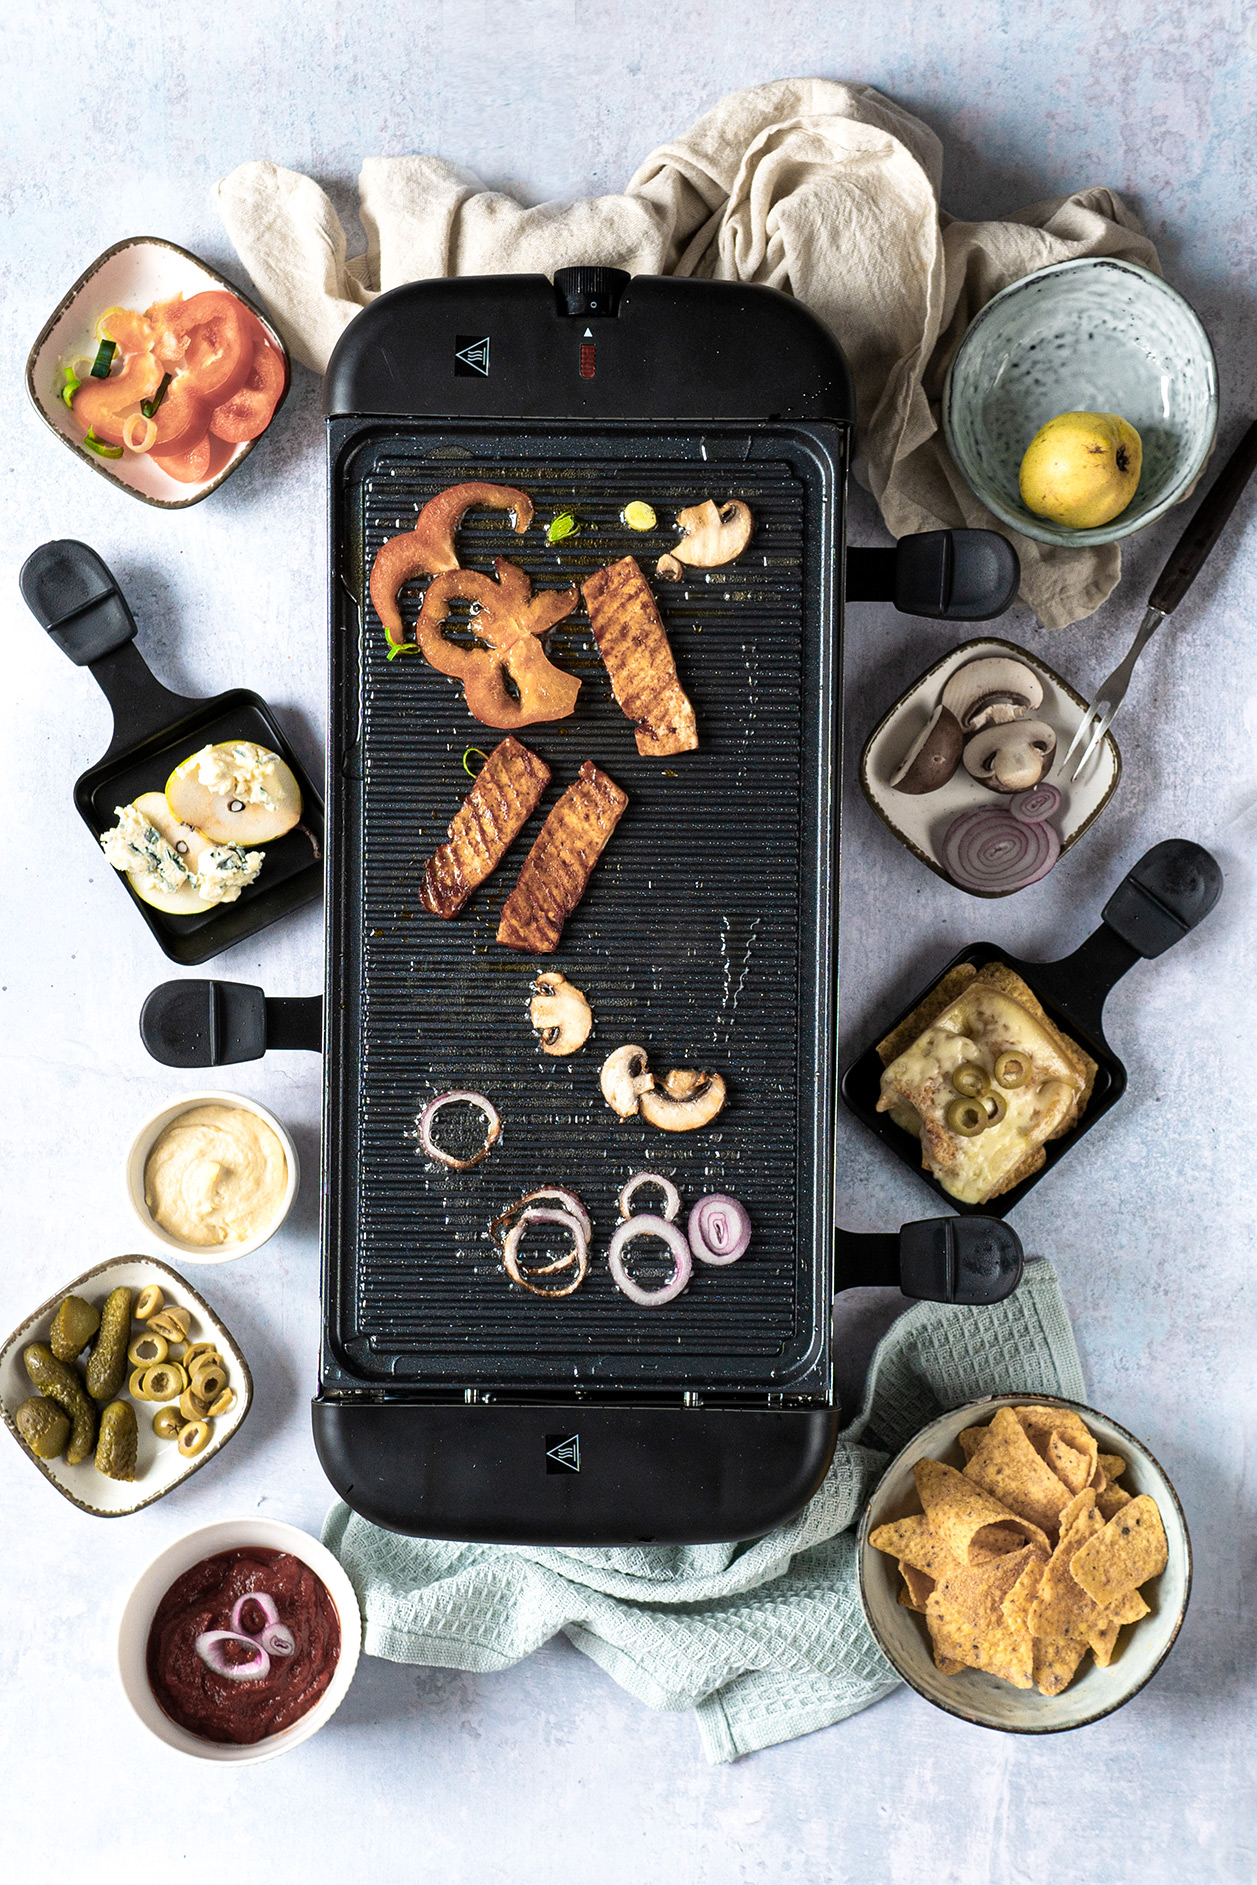 Raclette Ideen und verschiedene Dips